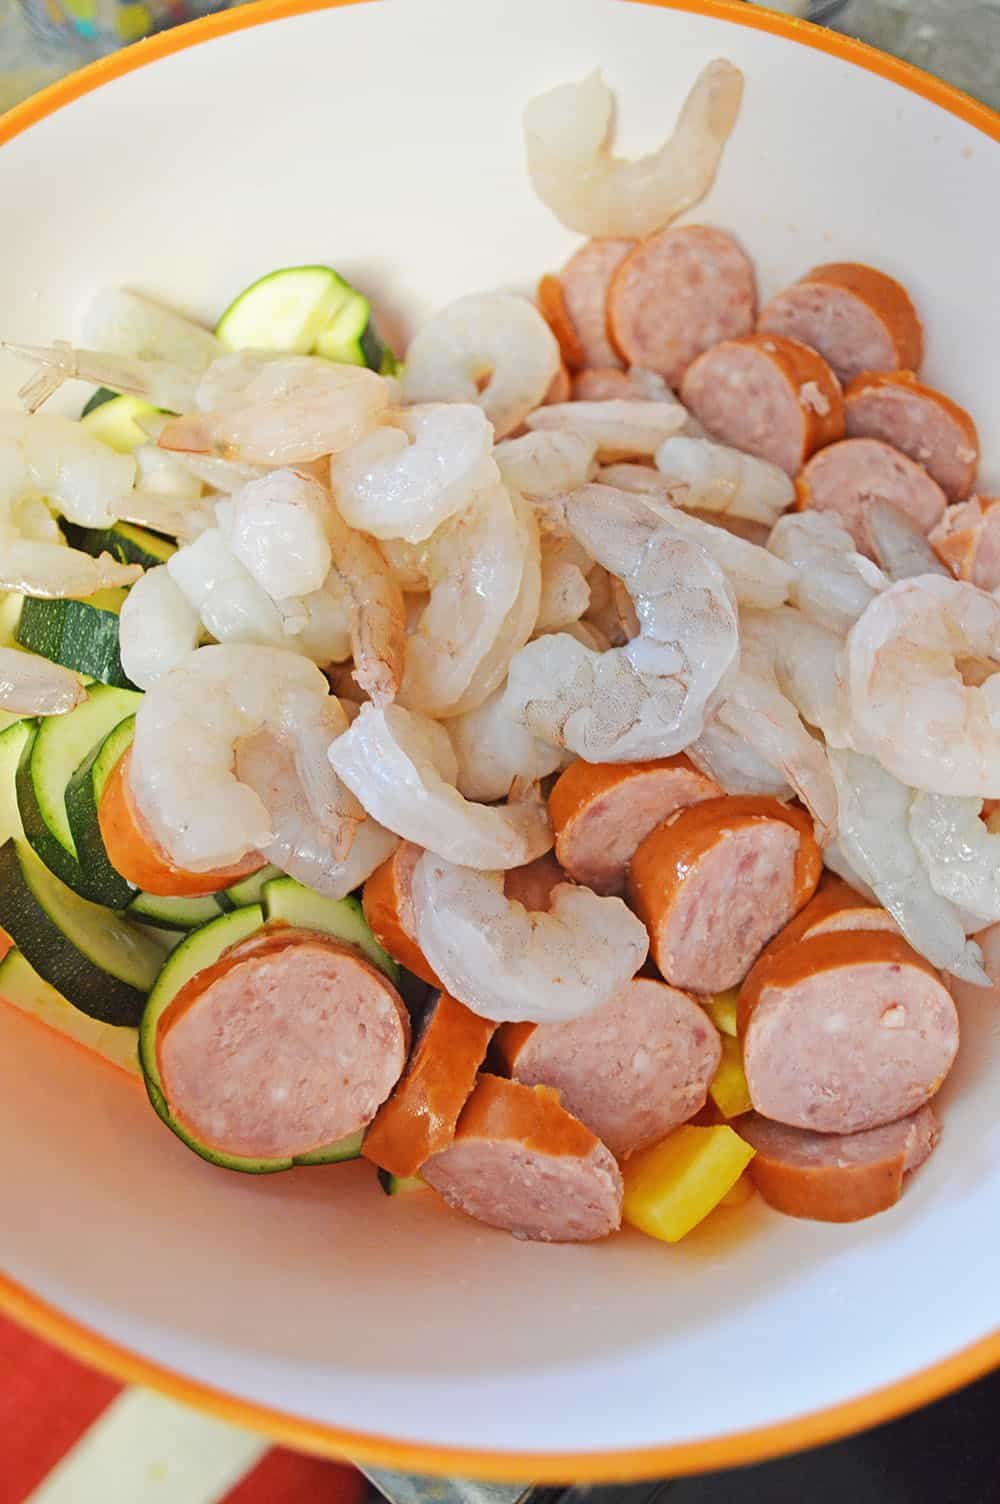 prep of sausage and shrimp skillet dish